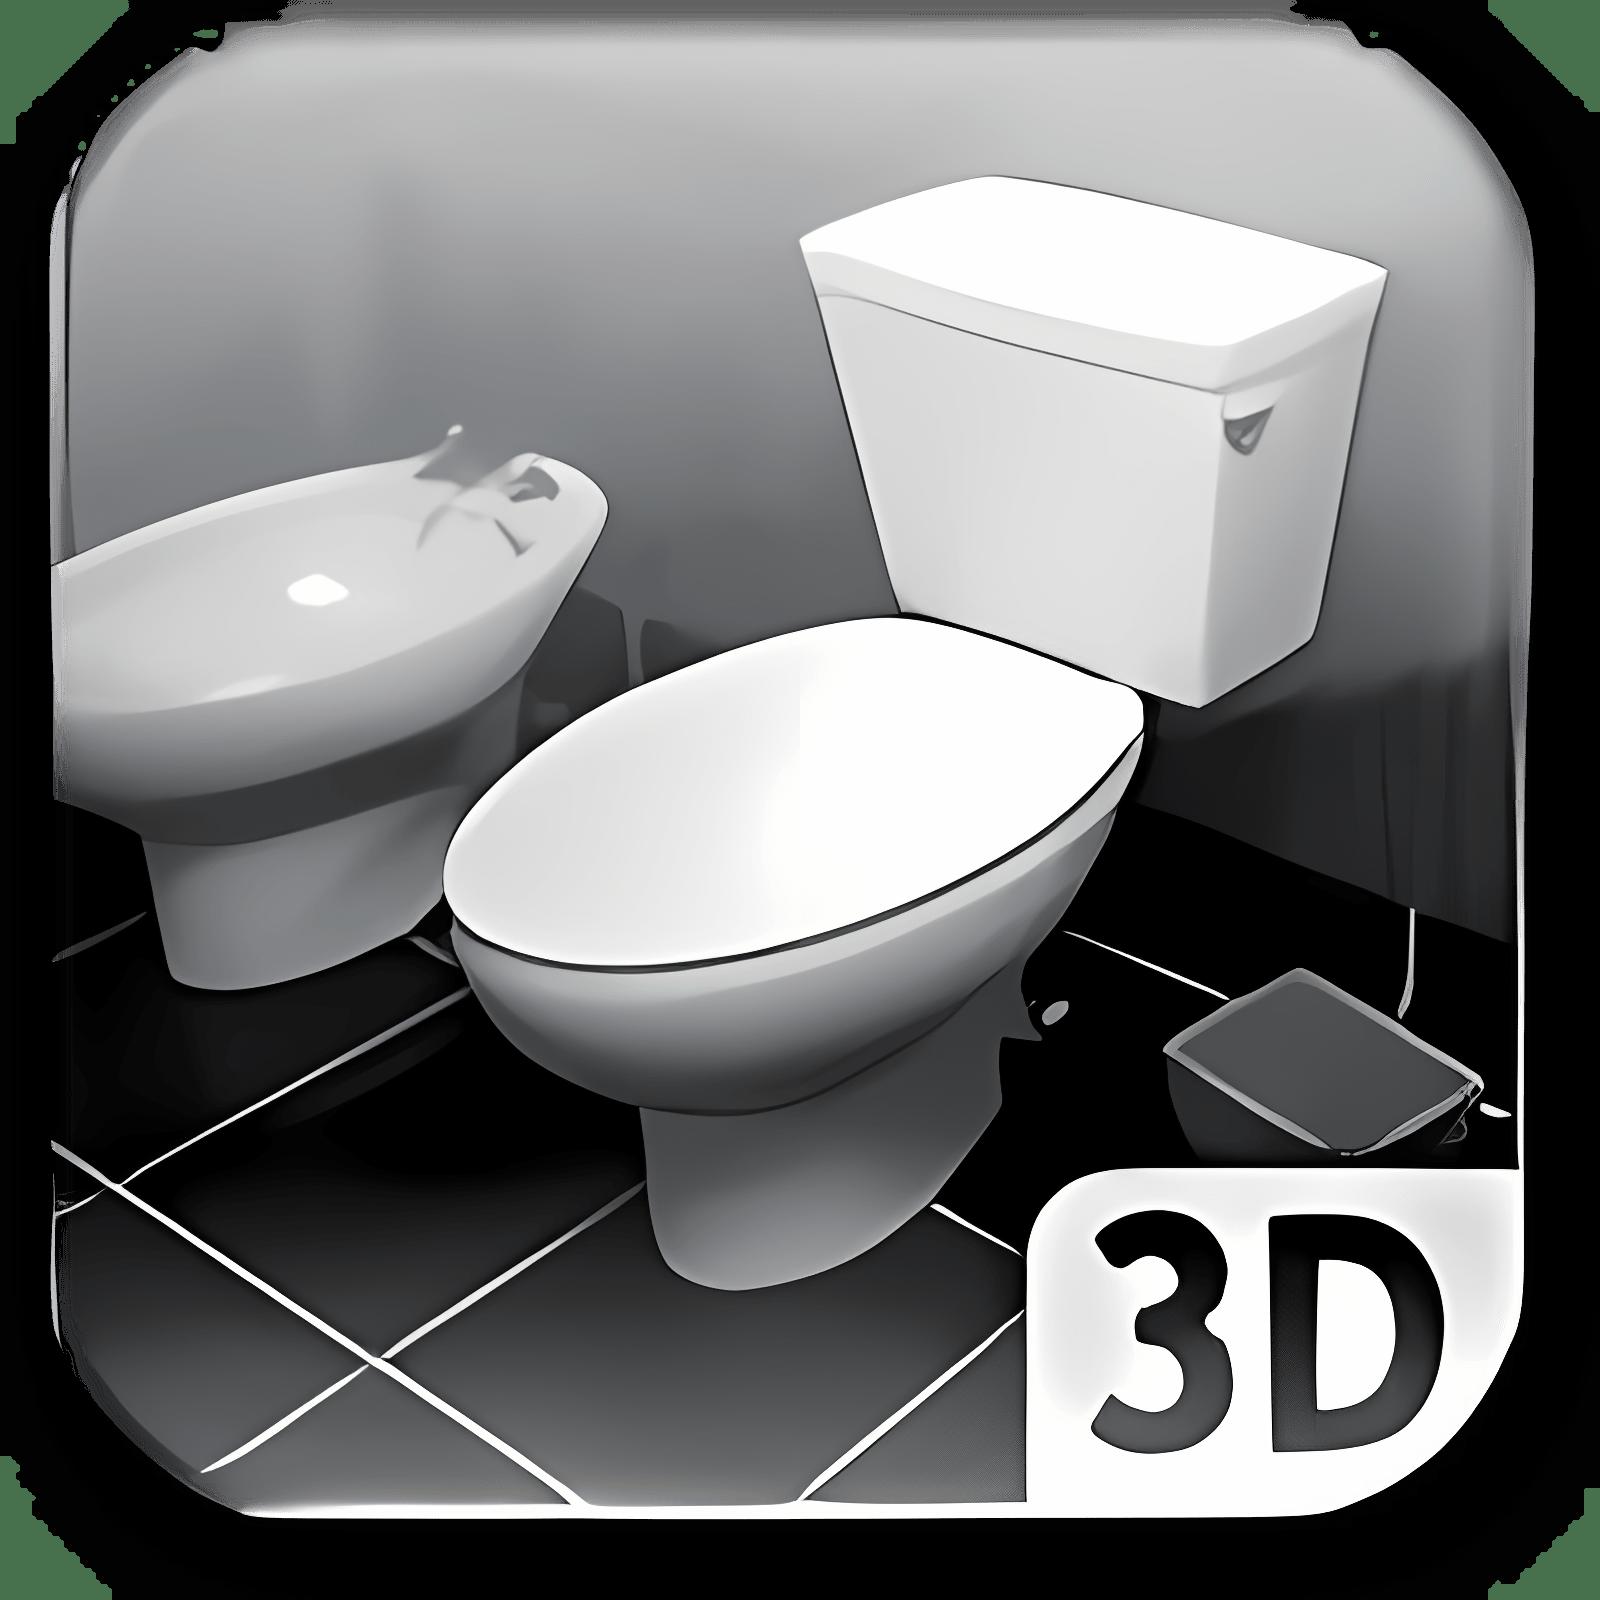 Escape 3D: The Bathroom 1